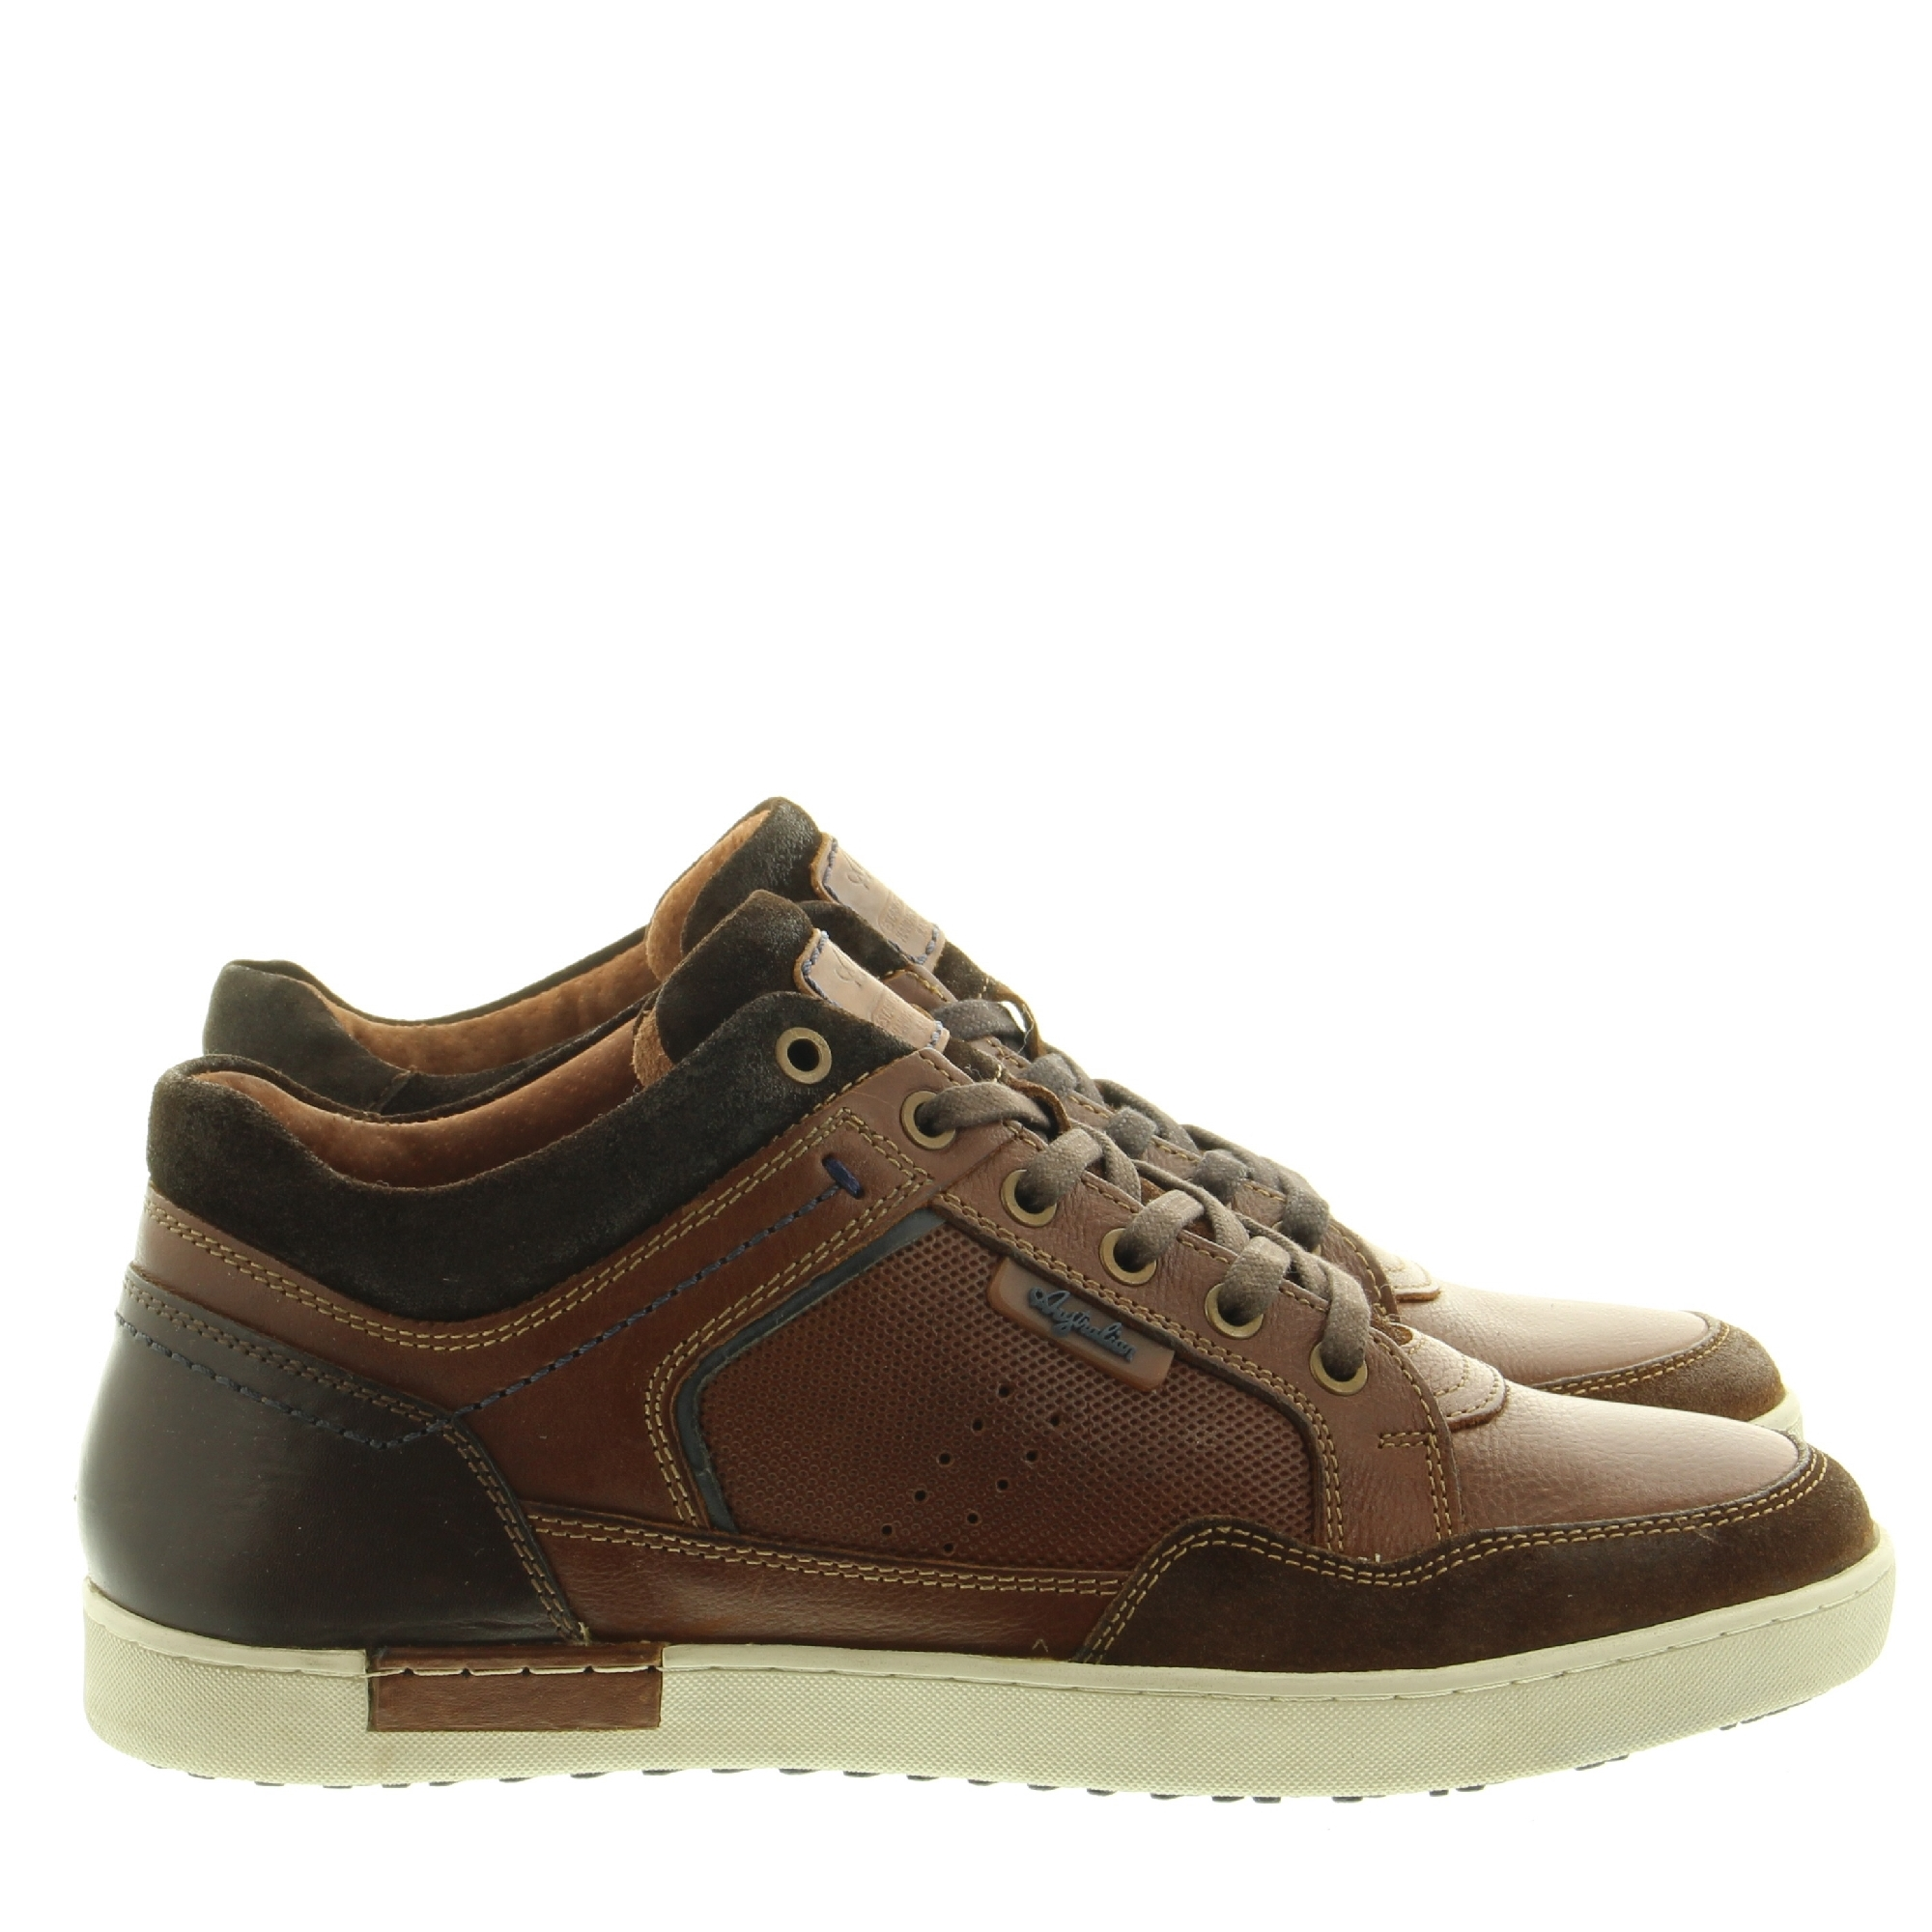 Australian Footwear Antrim 15.1373.02 A15 Dark Tan